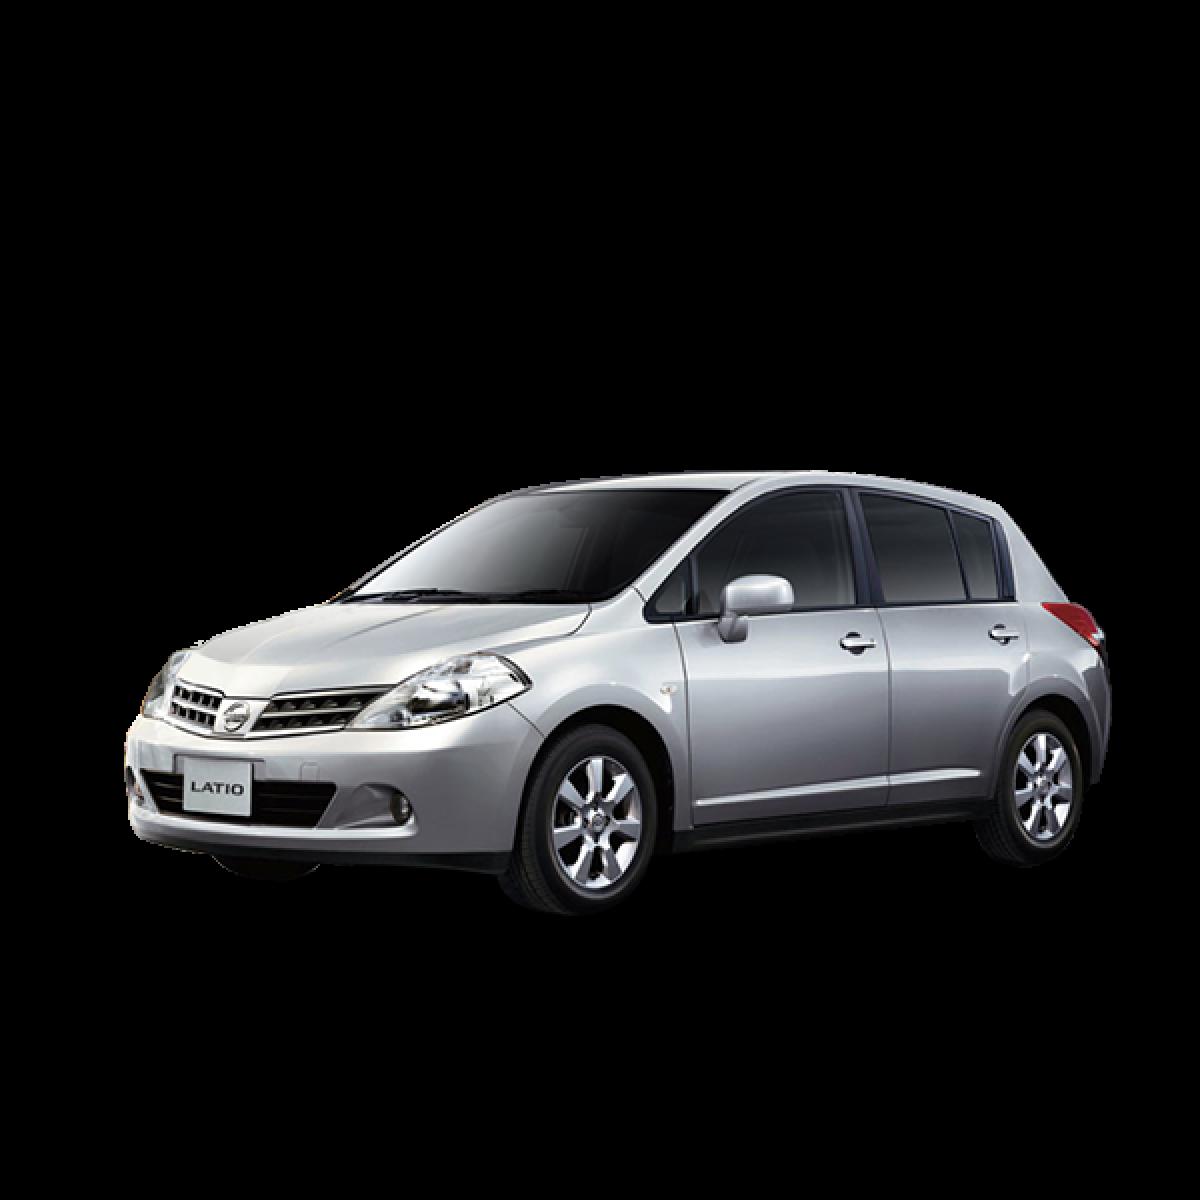 Nissan Hatchbacks: New Nissan Latio Hatchback Prices Mileage, Specs, Pictures